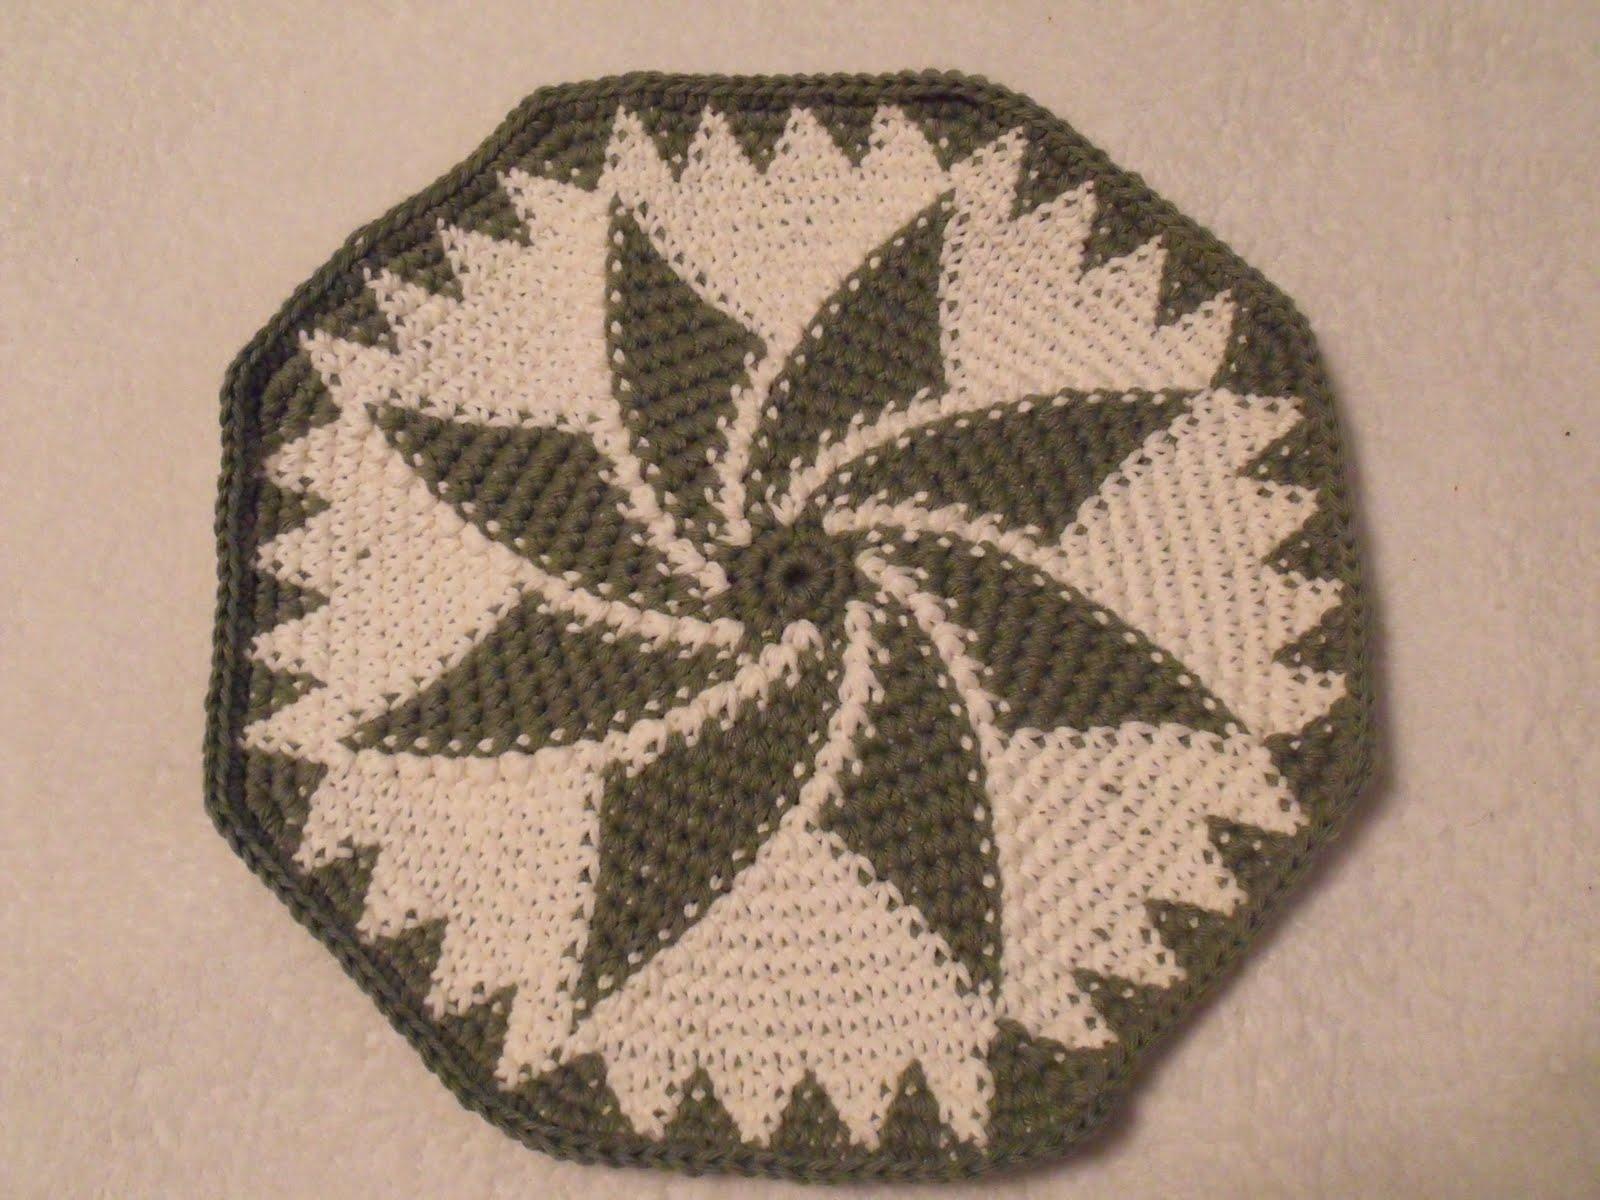 MIRASOLACE: Tapestry Crochet